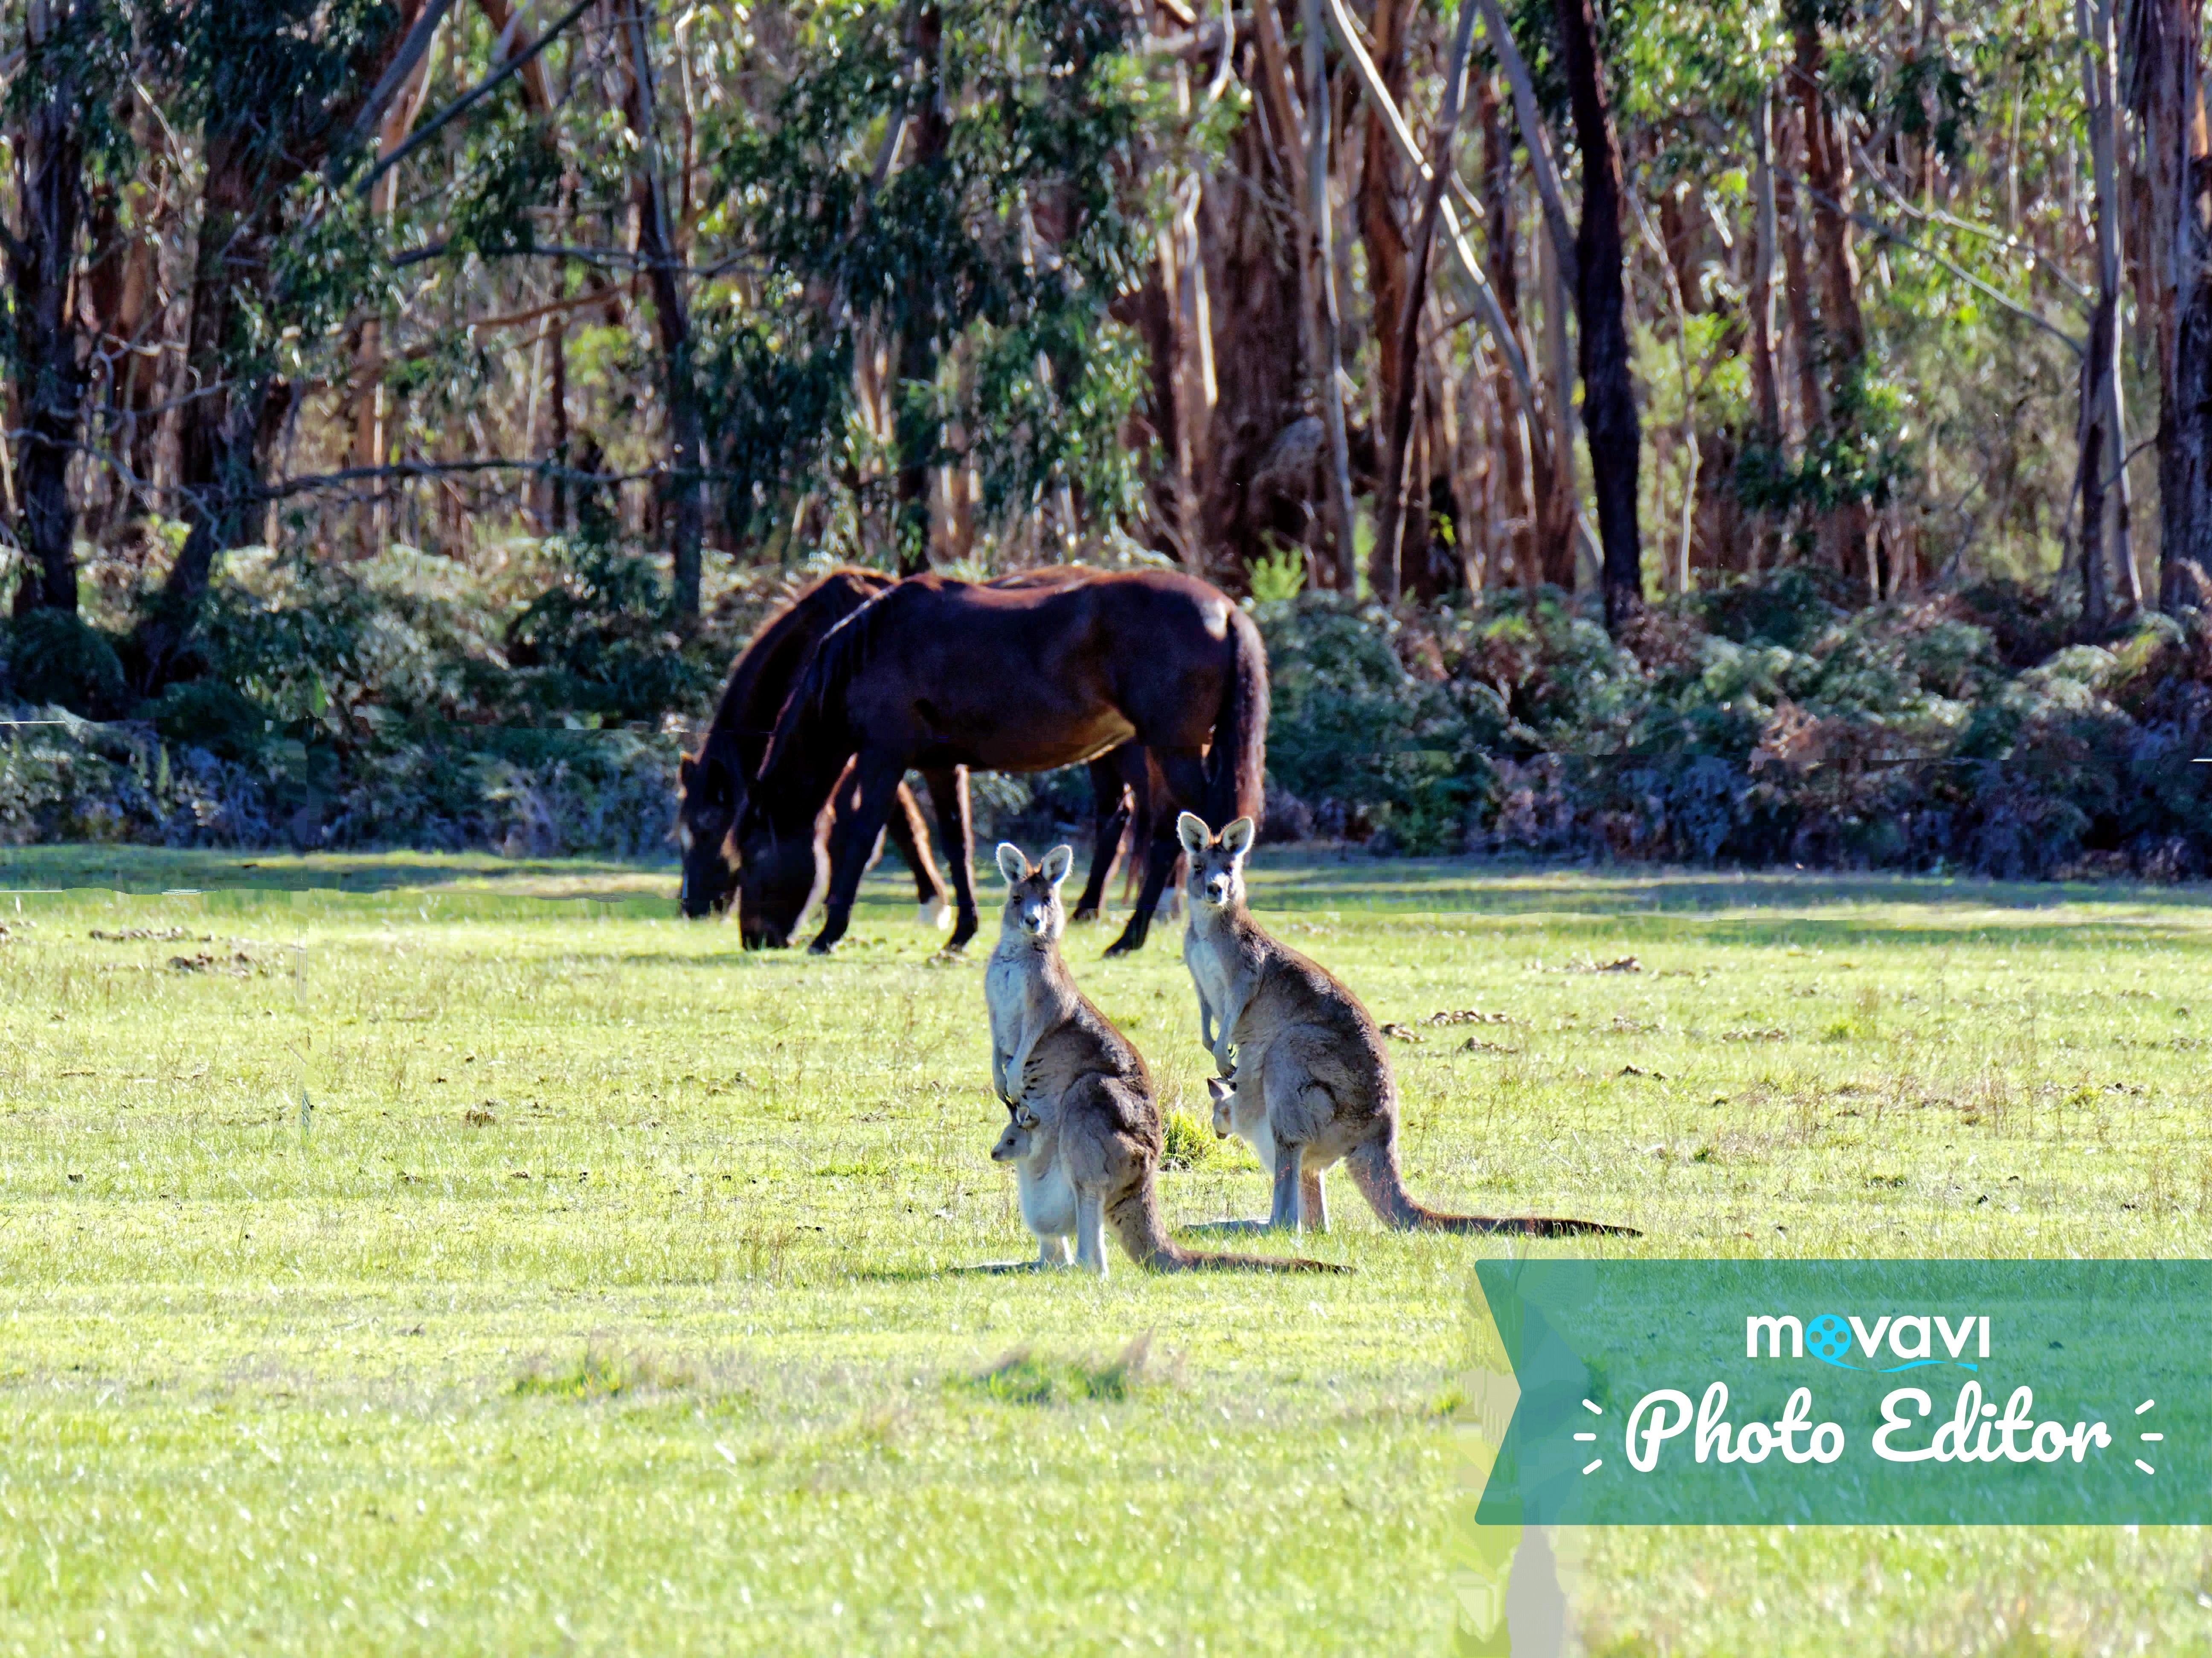 Kangaroos-47-movavi.jpeg